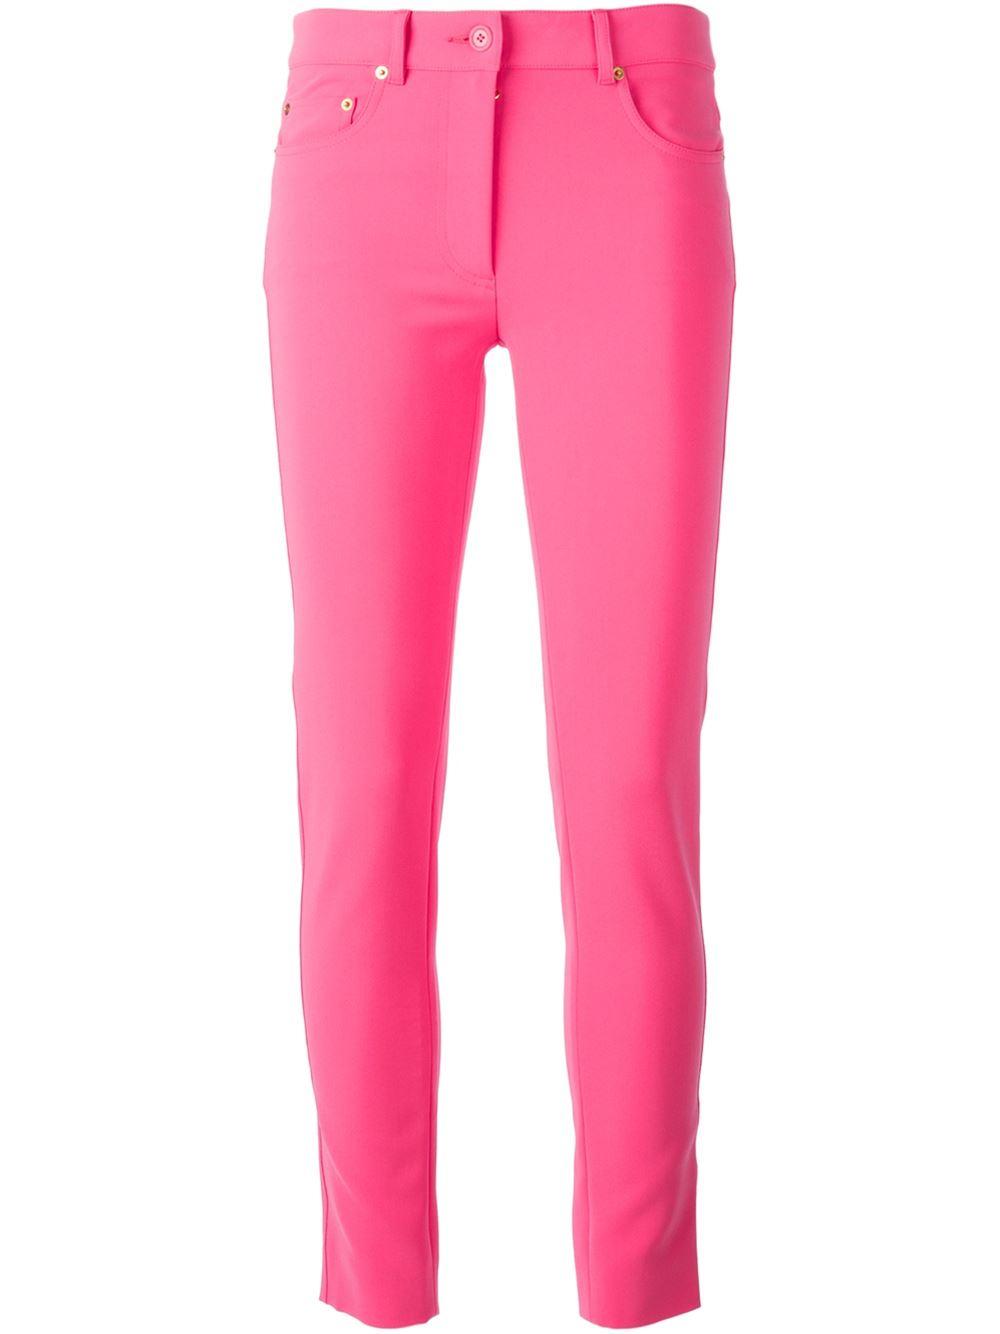 Denim Jeans Trends 2015